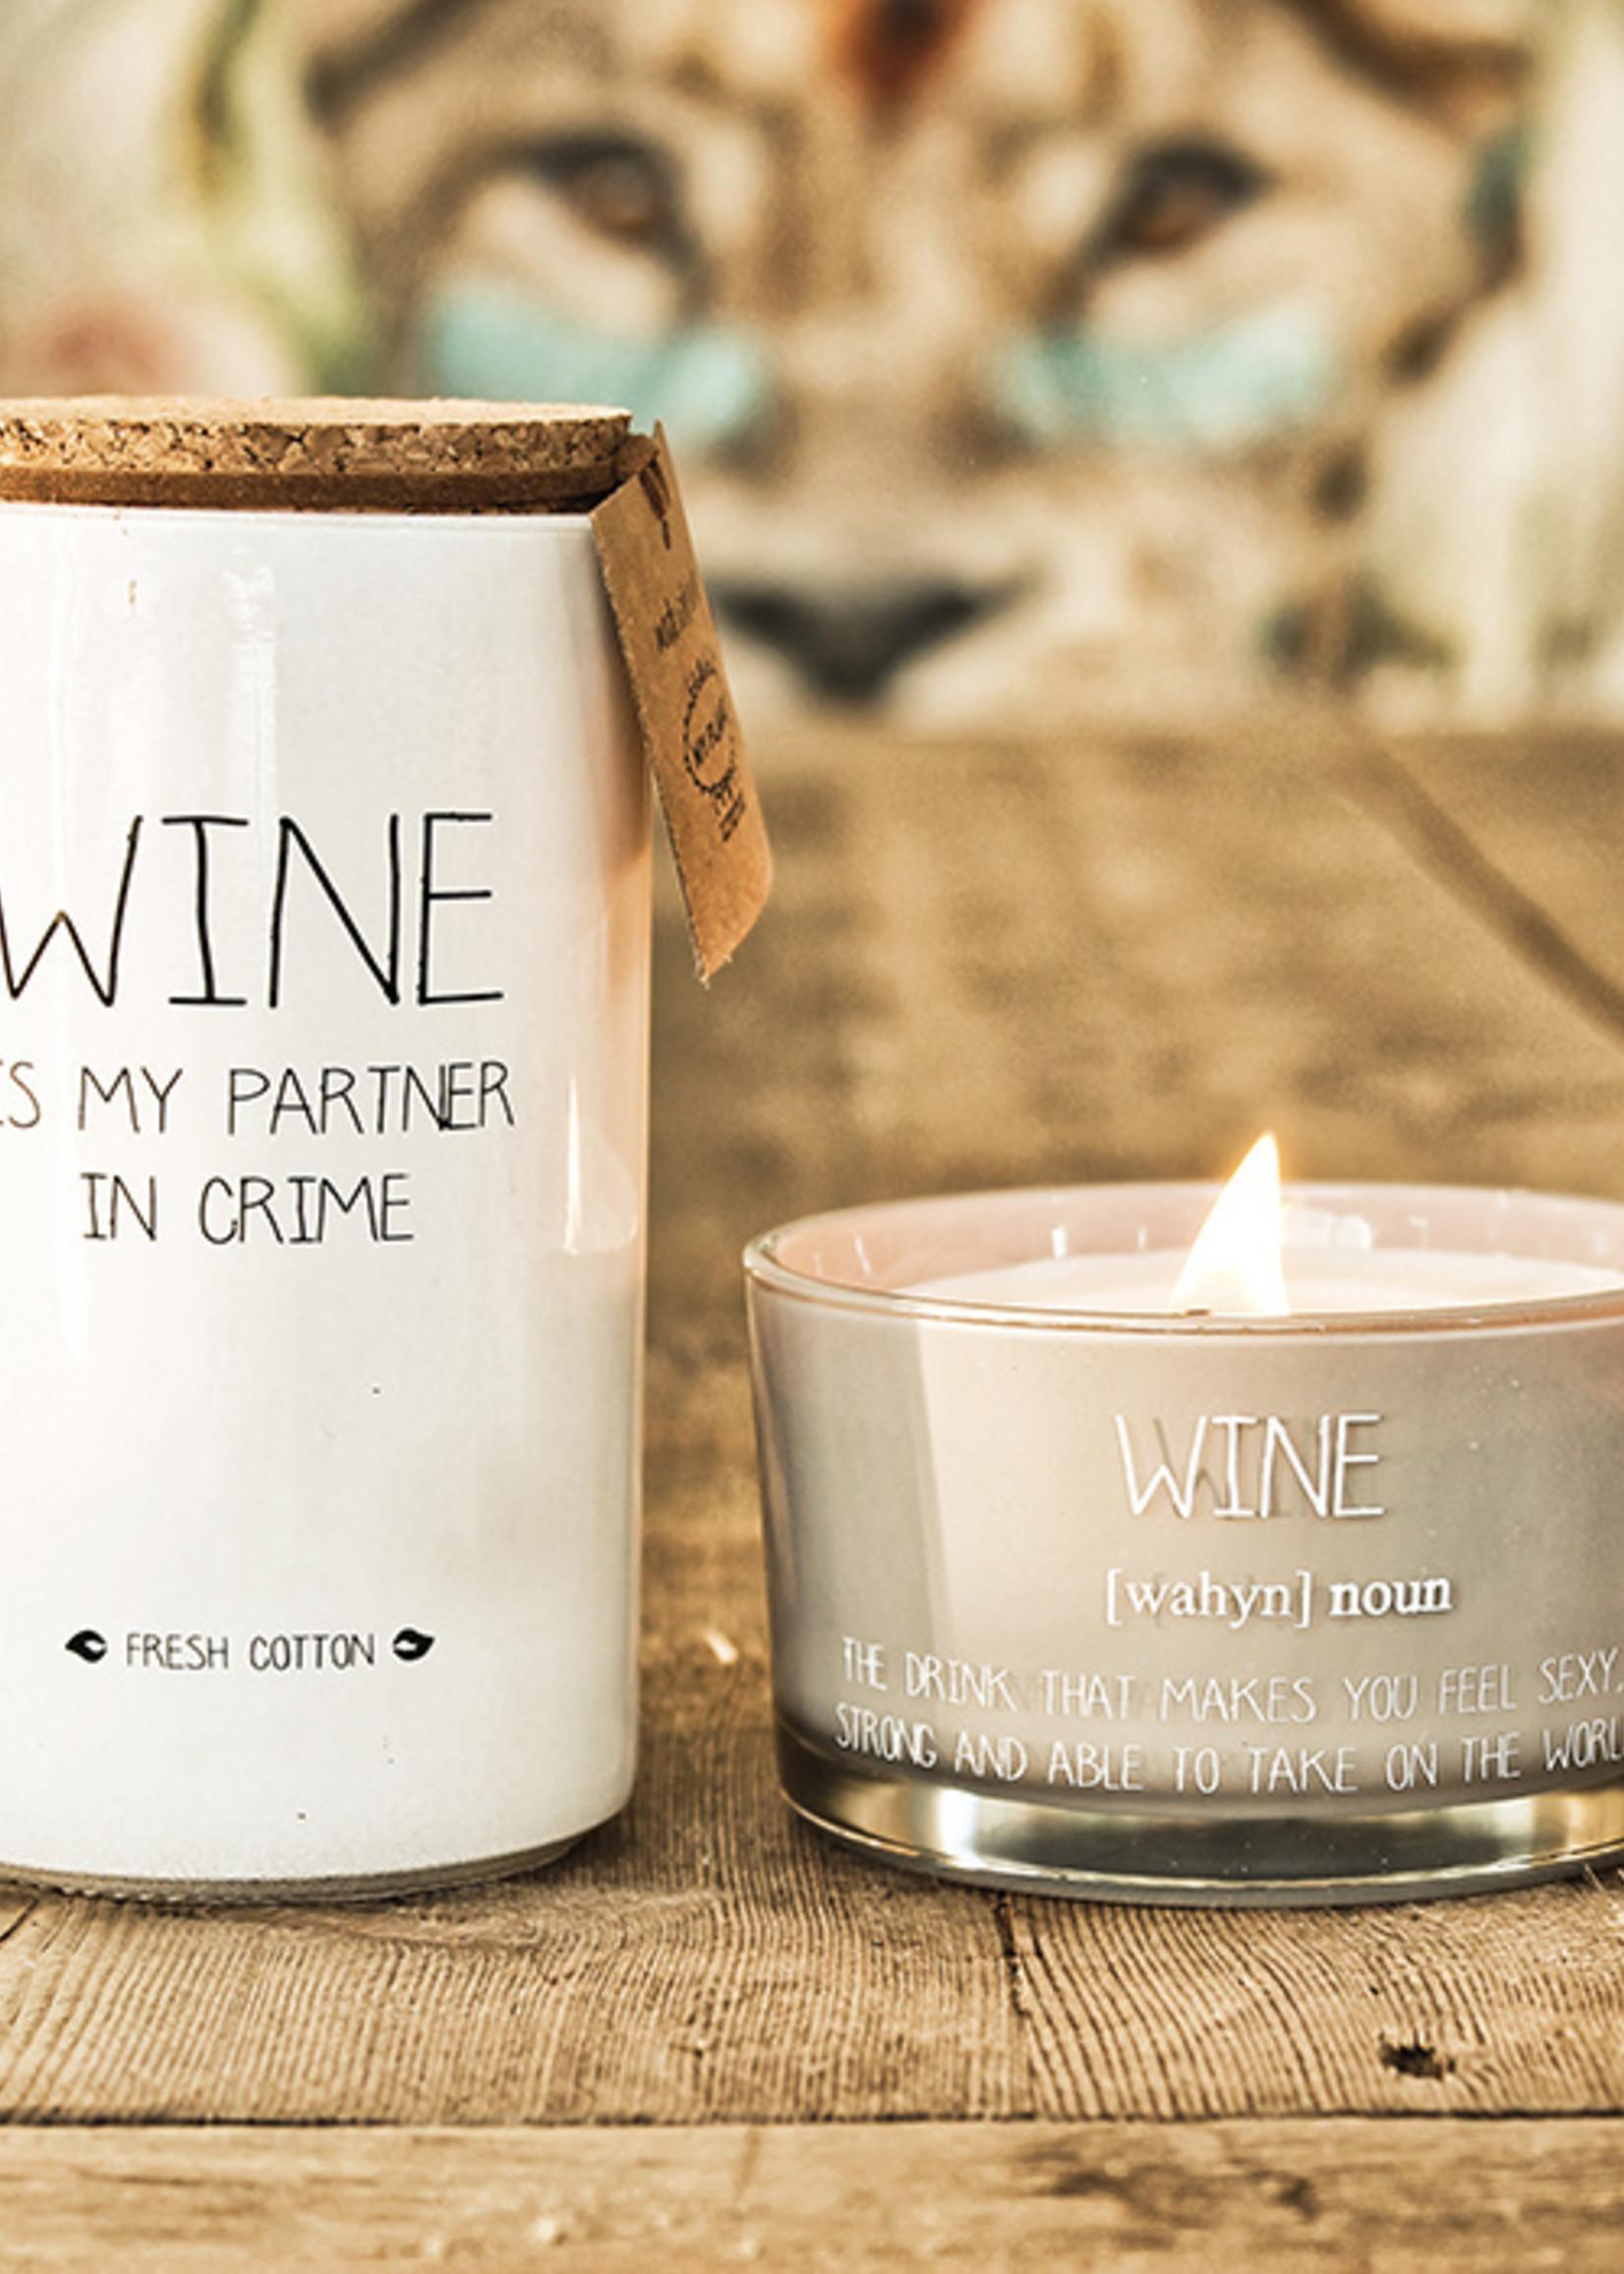 My Flame Lifestyle My Flame Wine Kaars